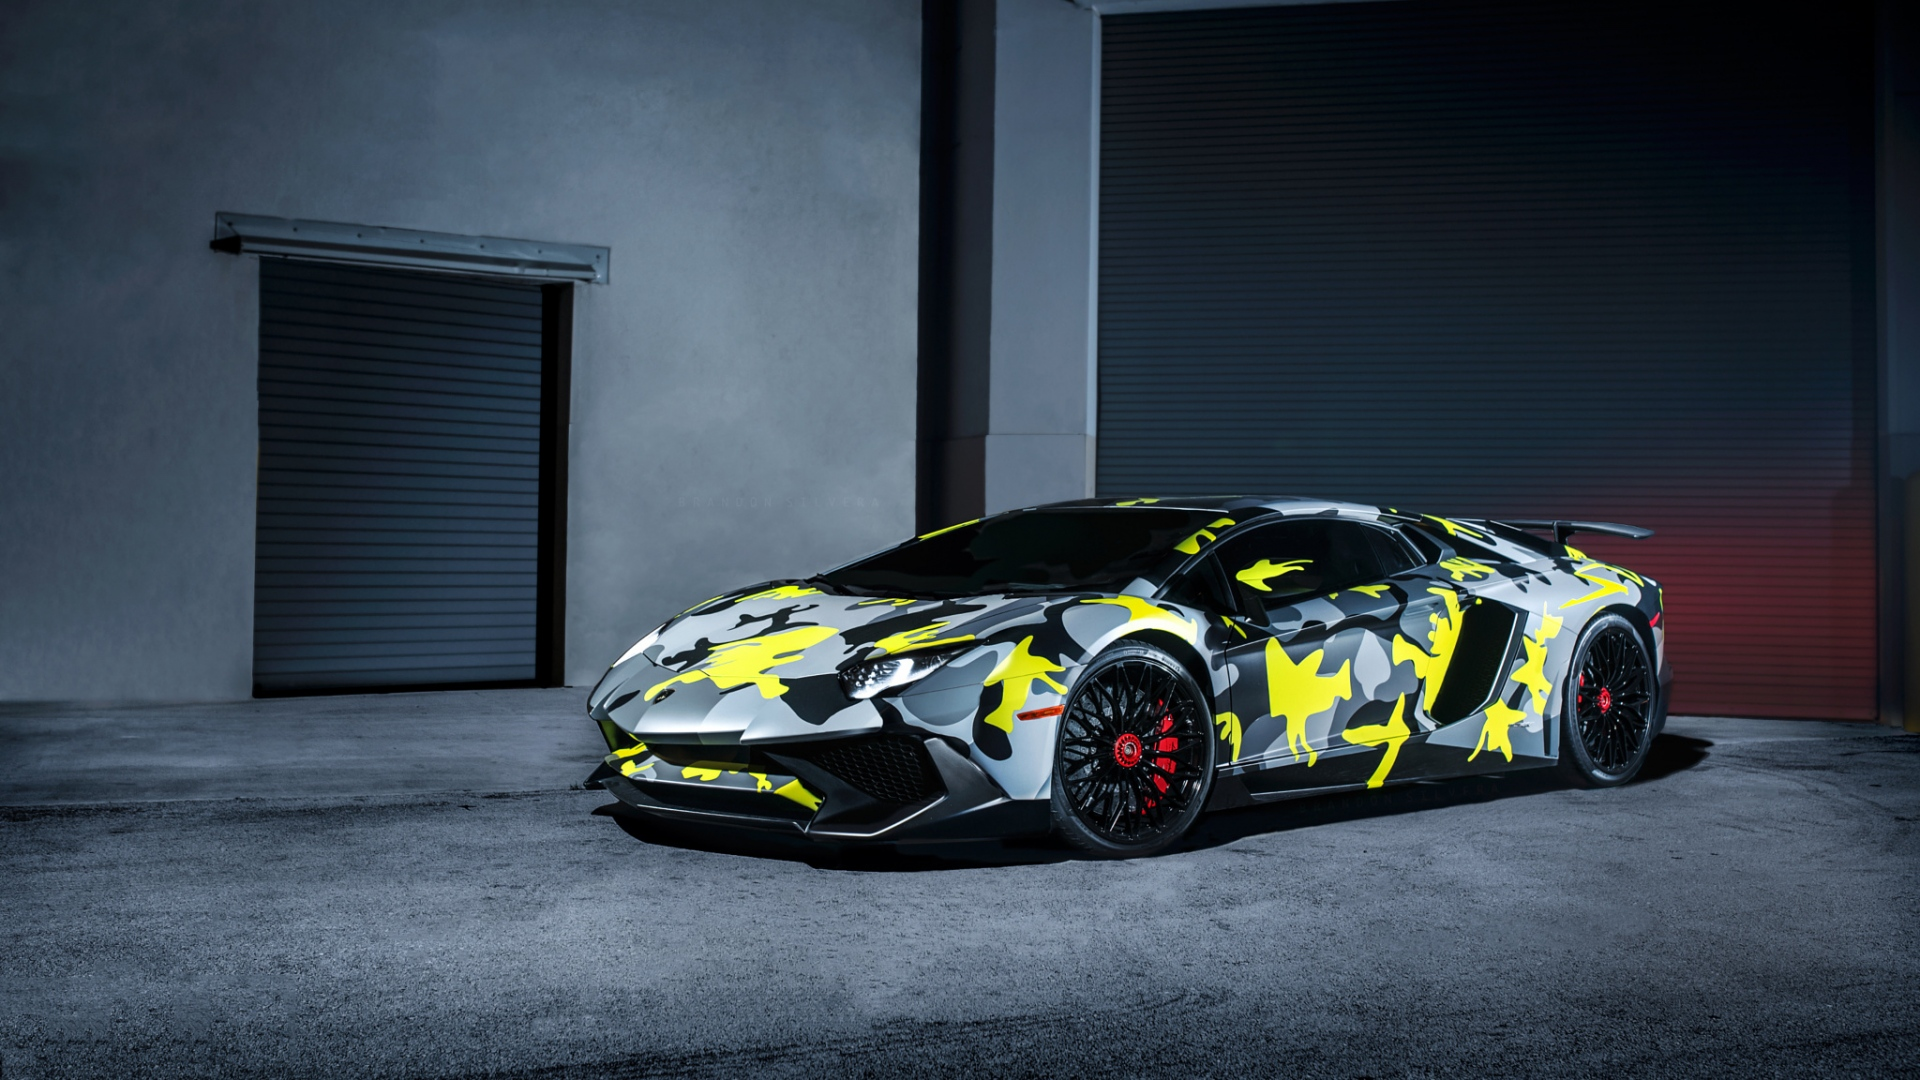 Lamborghini Aventador Wallpapers   3JH7E42   4USkY 1920x1080